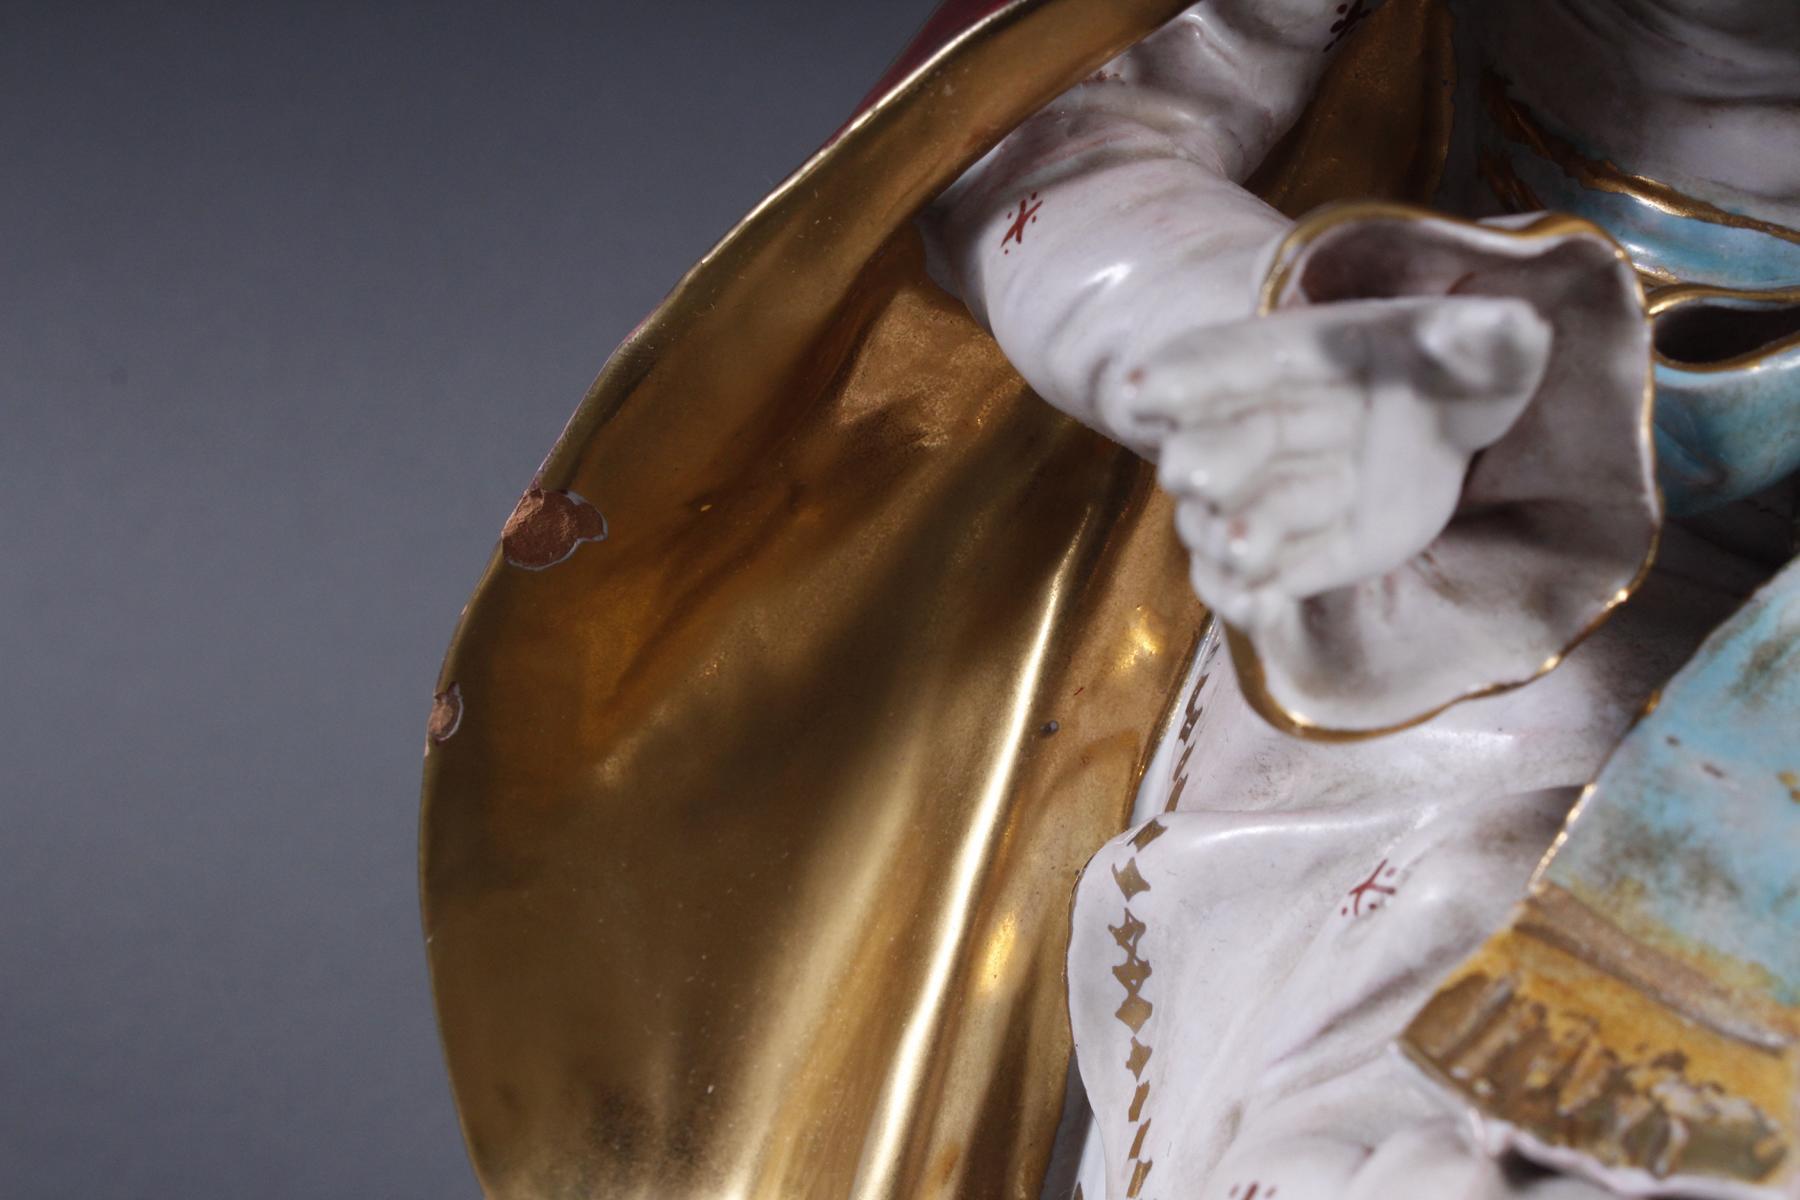 Keramik-Skulptur Madonna mit Kind, wohl Italien 2. Hälfte 20. Jh.-3